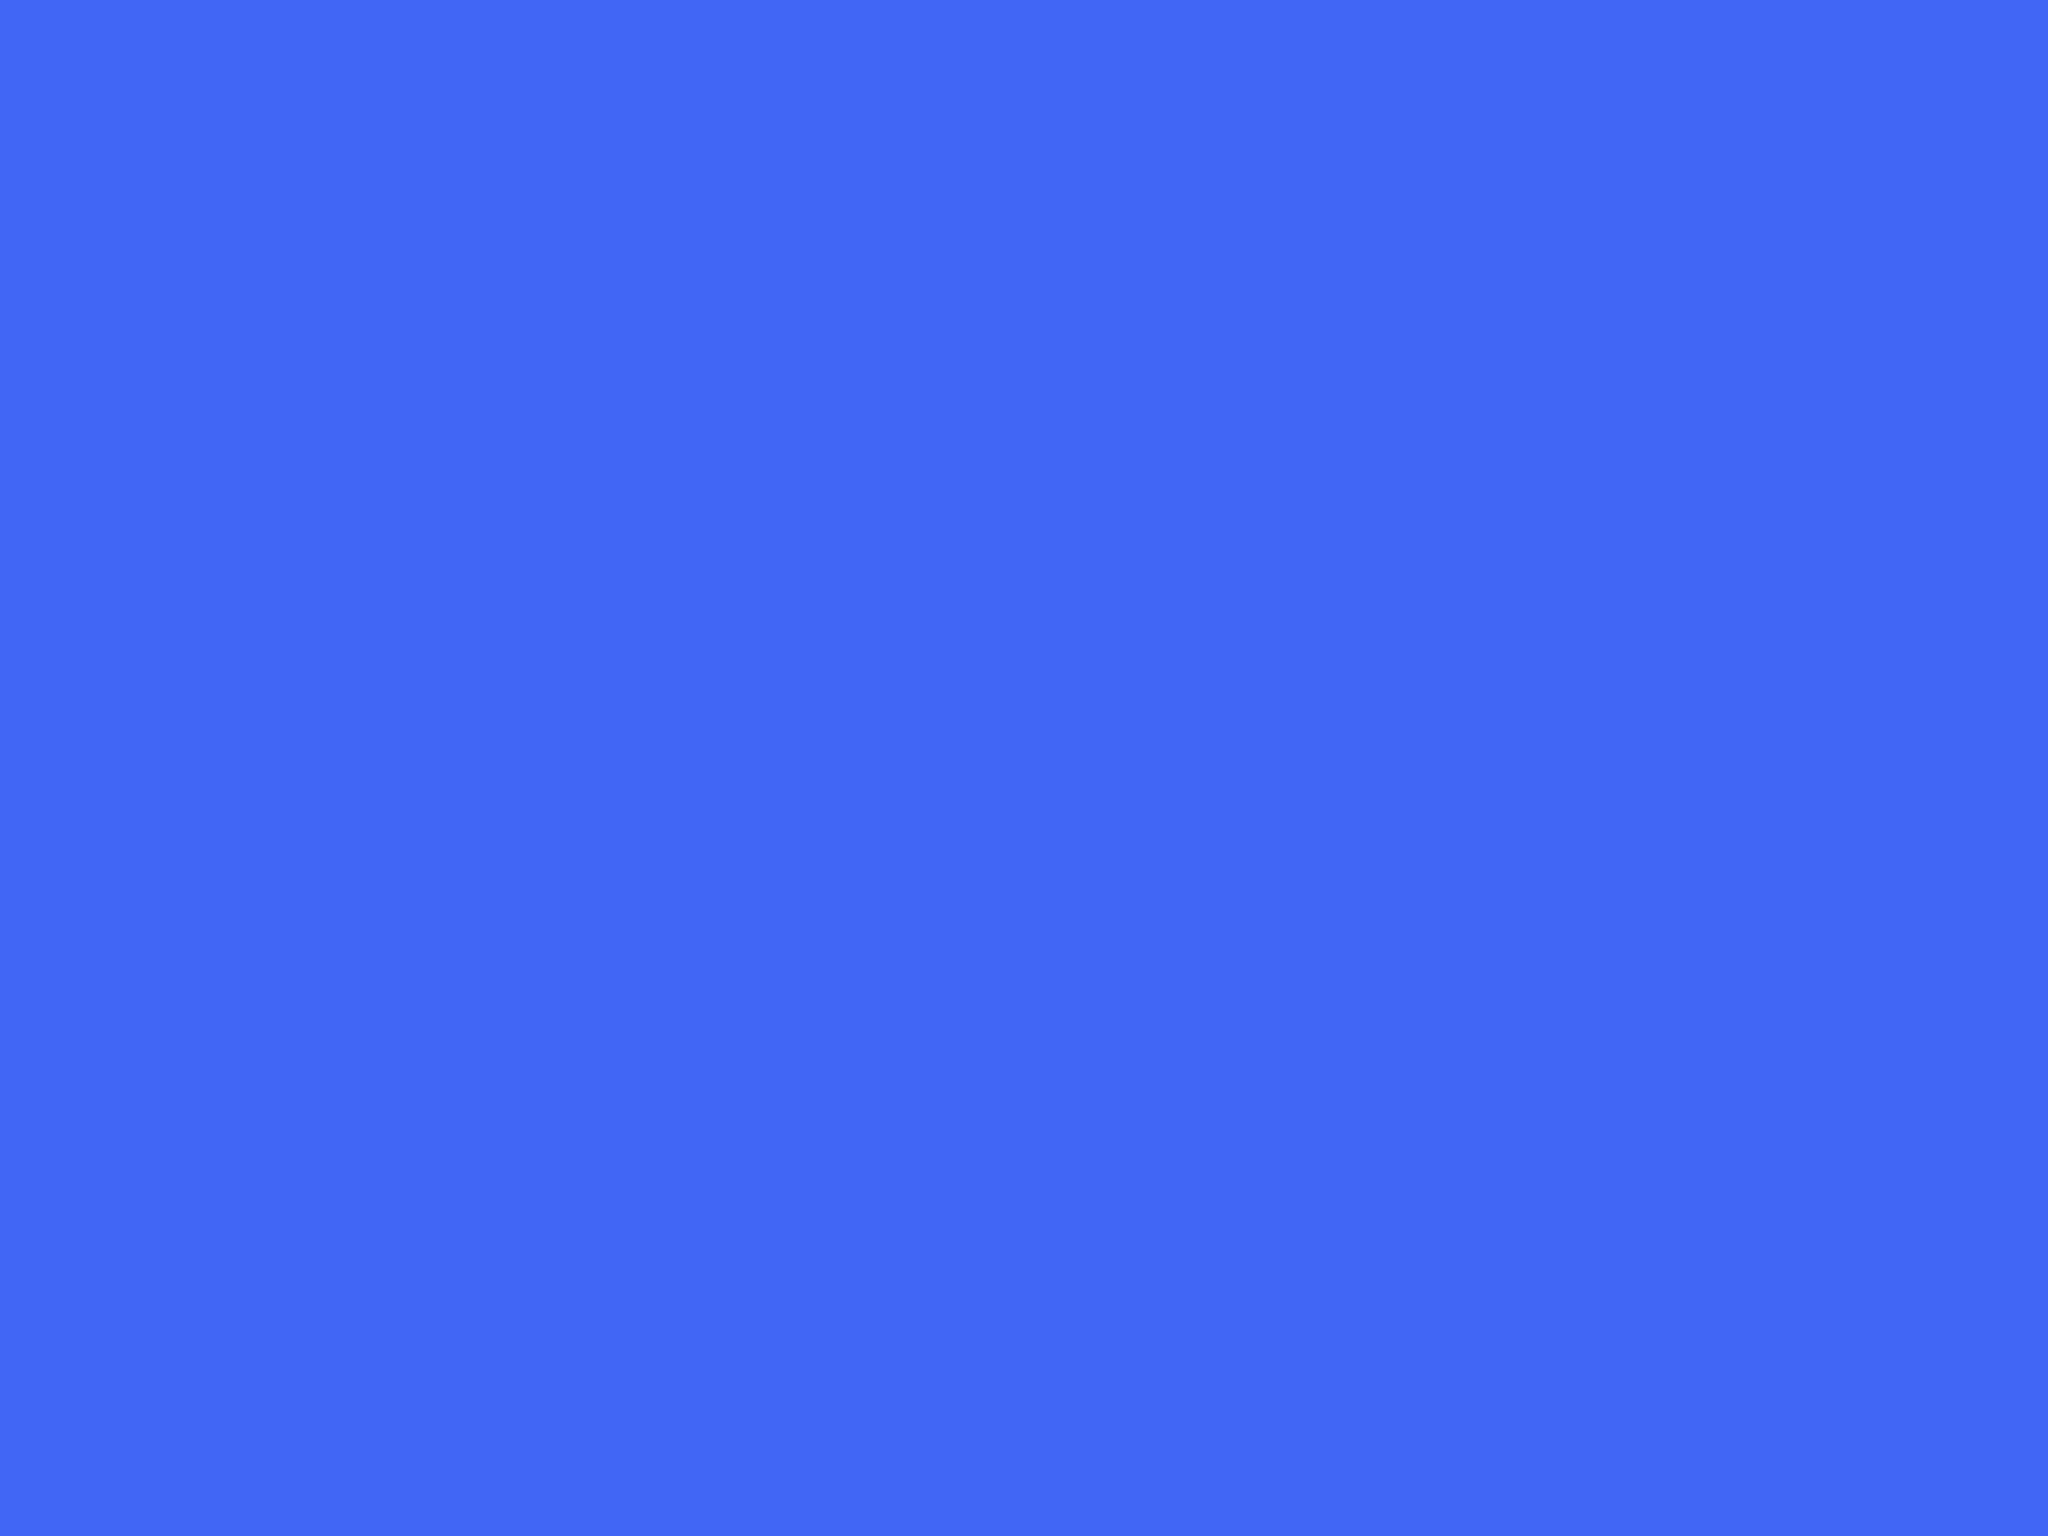 2048x1536 Ultramarine Blue Solid Color Background